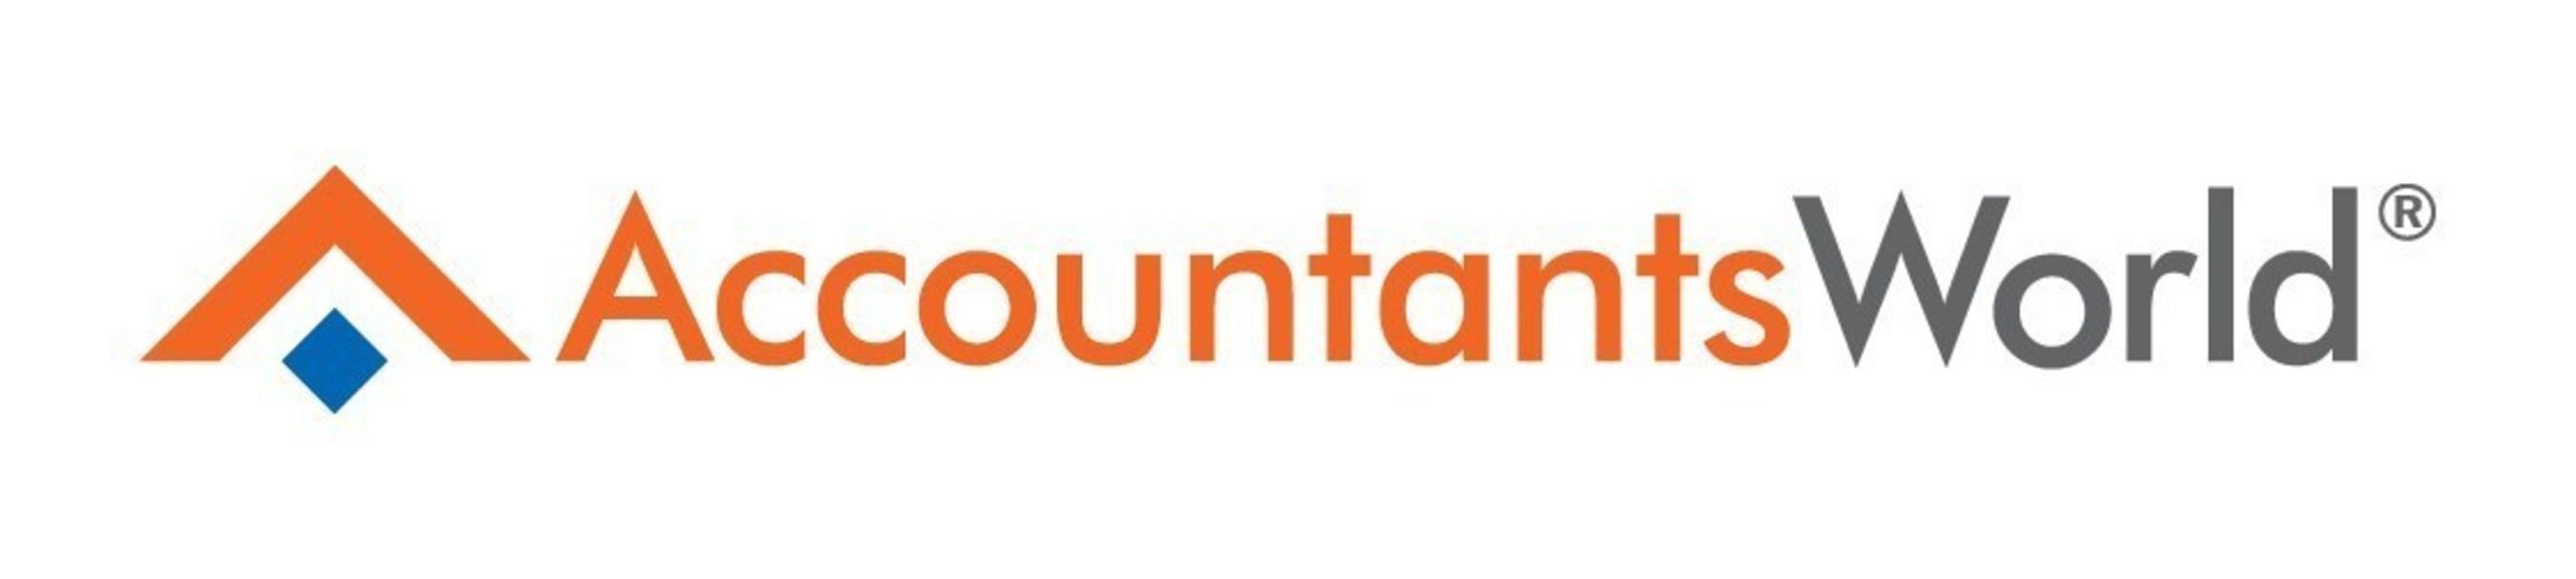 AccountantsWorld Logo